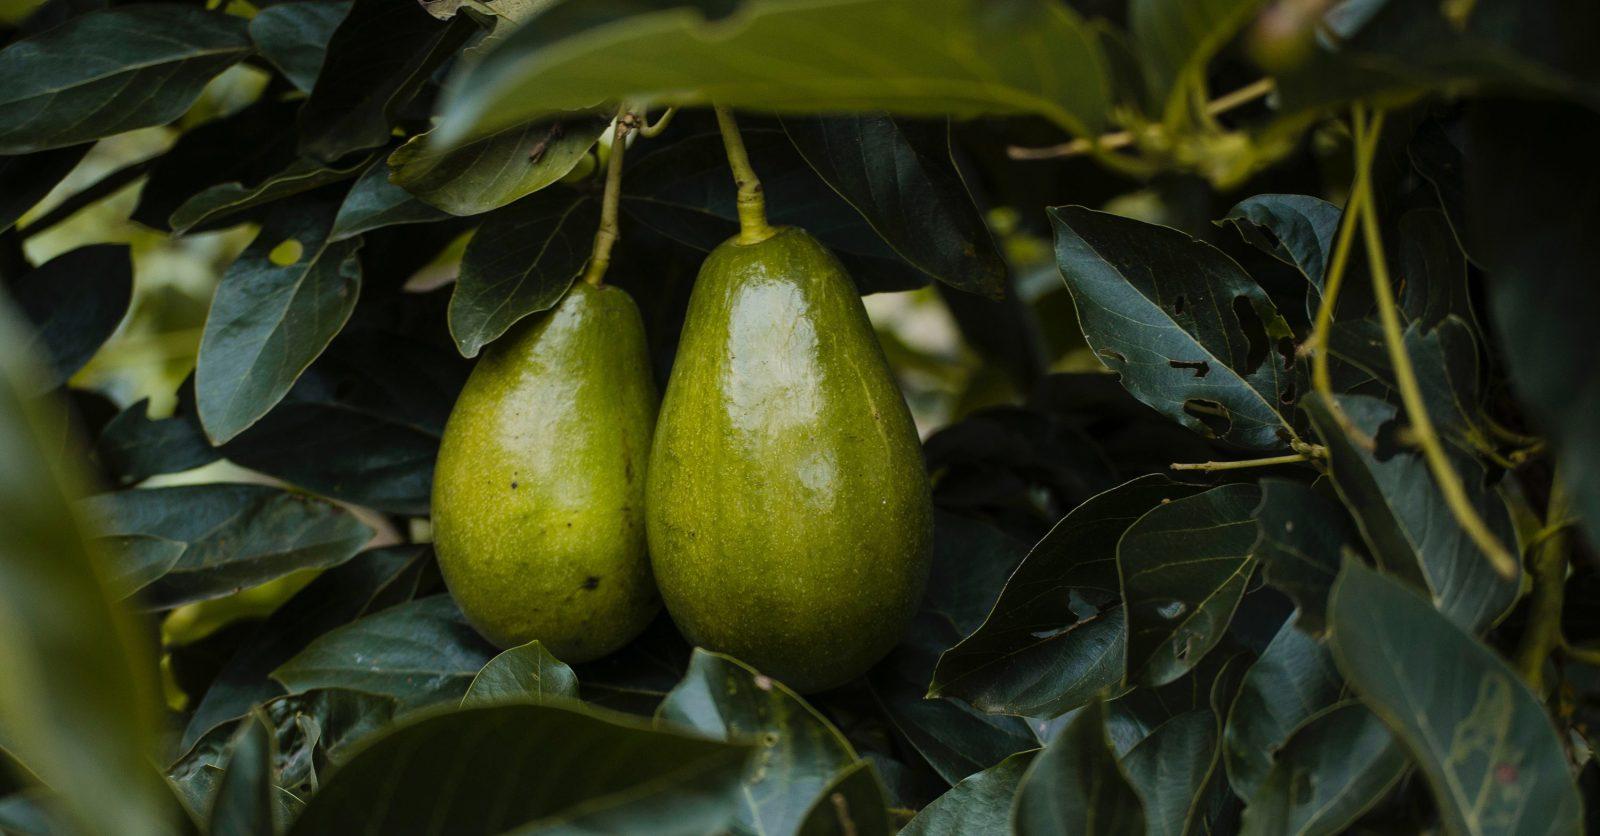 aguacates-avocado-avocados-1261994